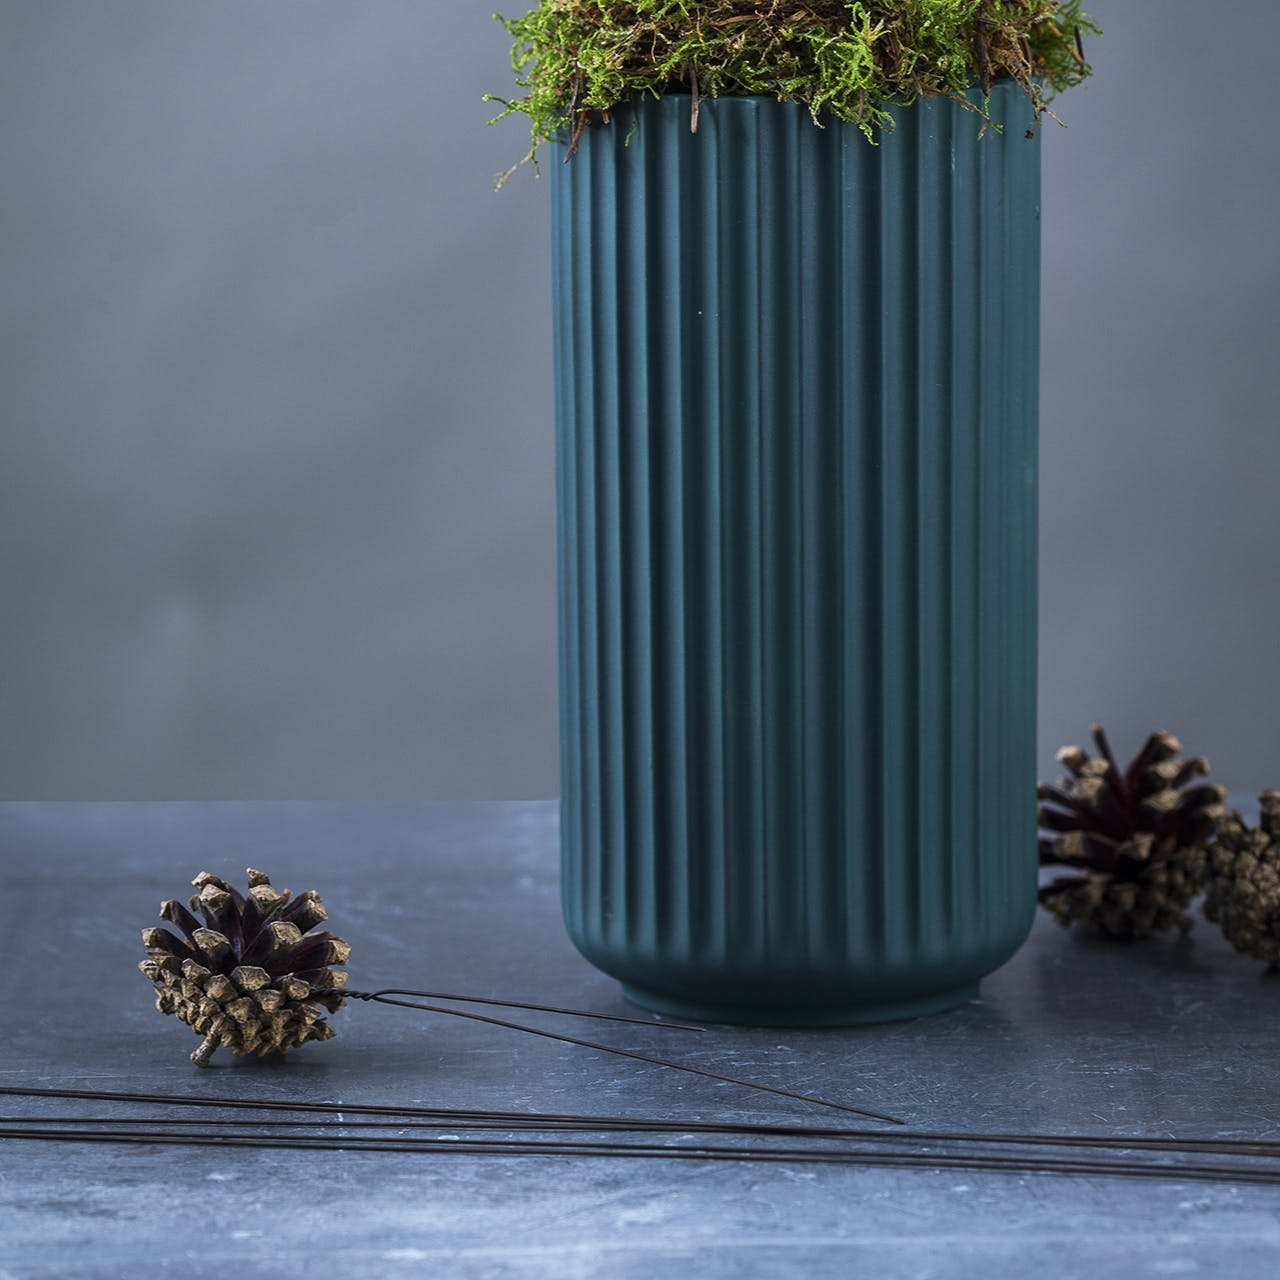 kalenderlys annette von einem dekoration jul juledekoration vase og lys kogler